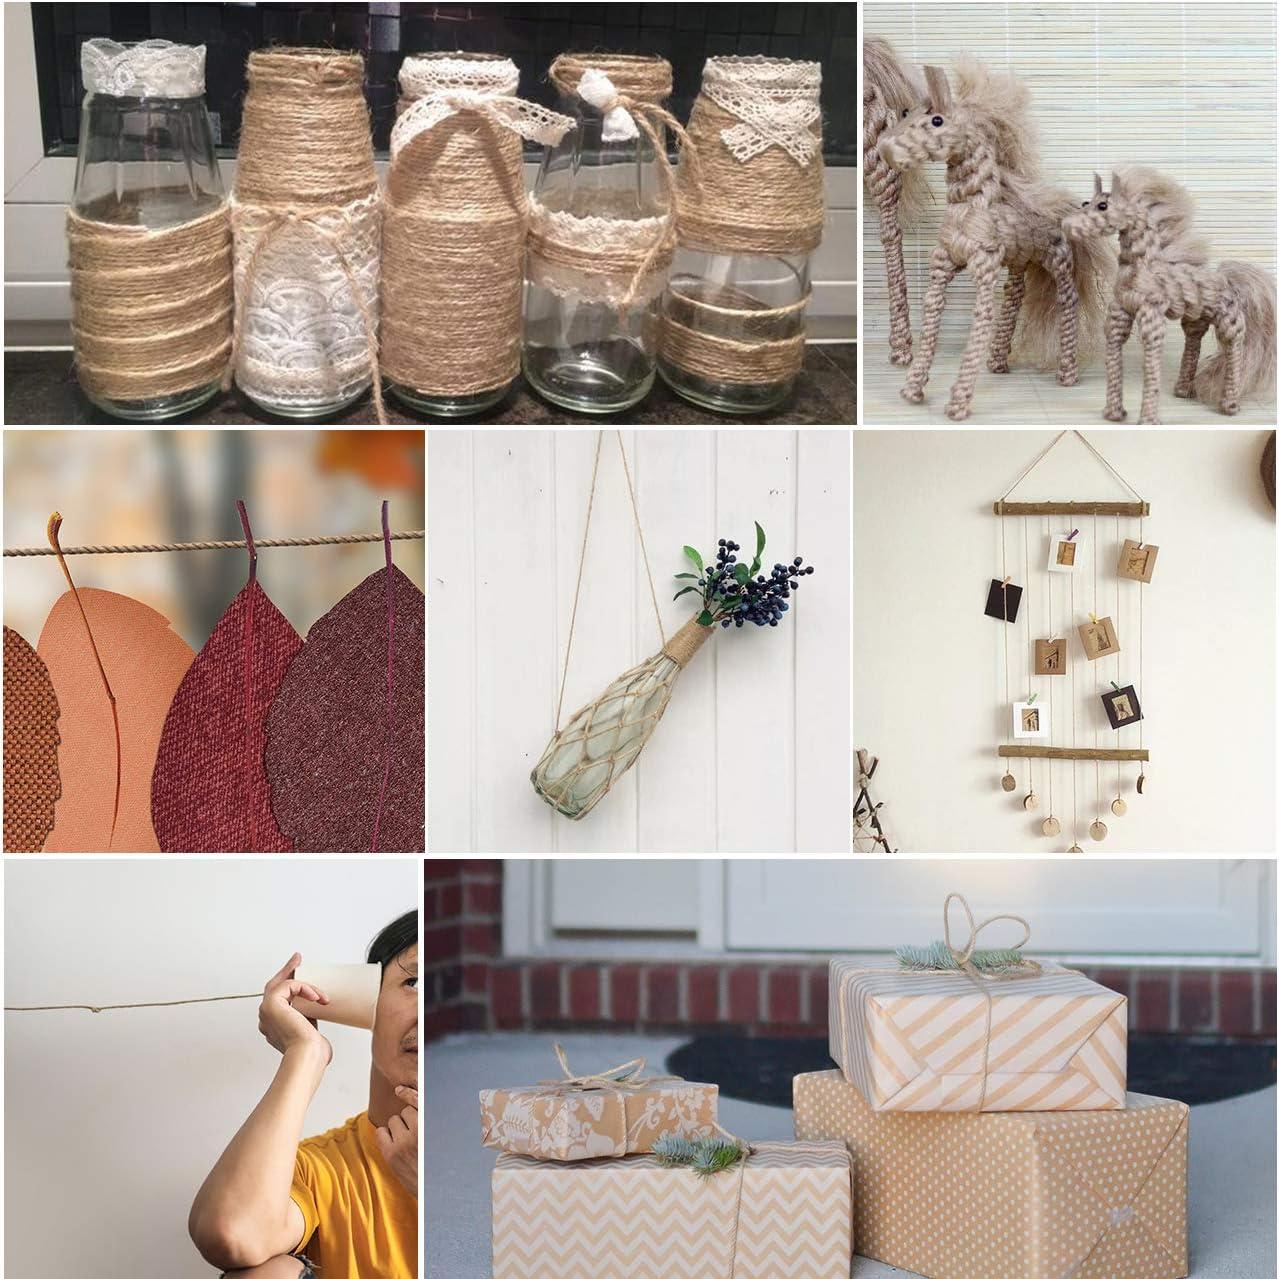 2 Pcs 200 Yard Jute Twine Natural Jute Rope Industrial Packing Materials Packing String for Gifts DIY Crafts Decoration Bundling Gardening